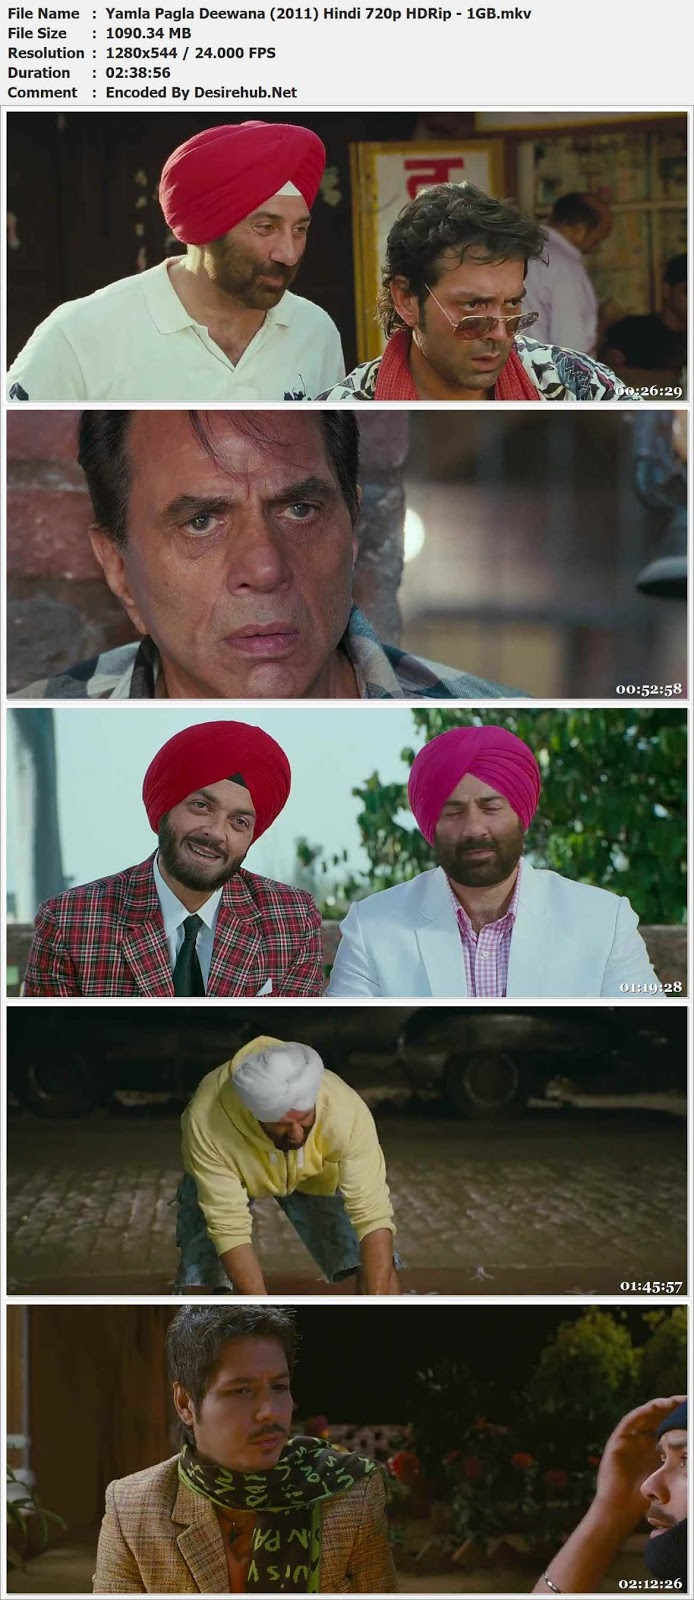 Yamla Pagla Deewana (2011) Hindi 720p HDRip – 1GB Desirehub